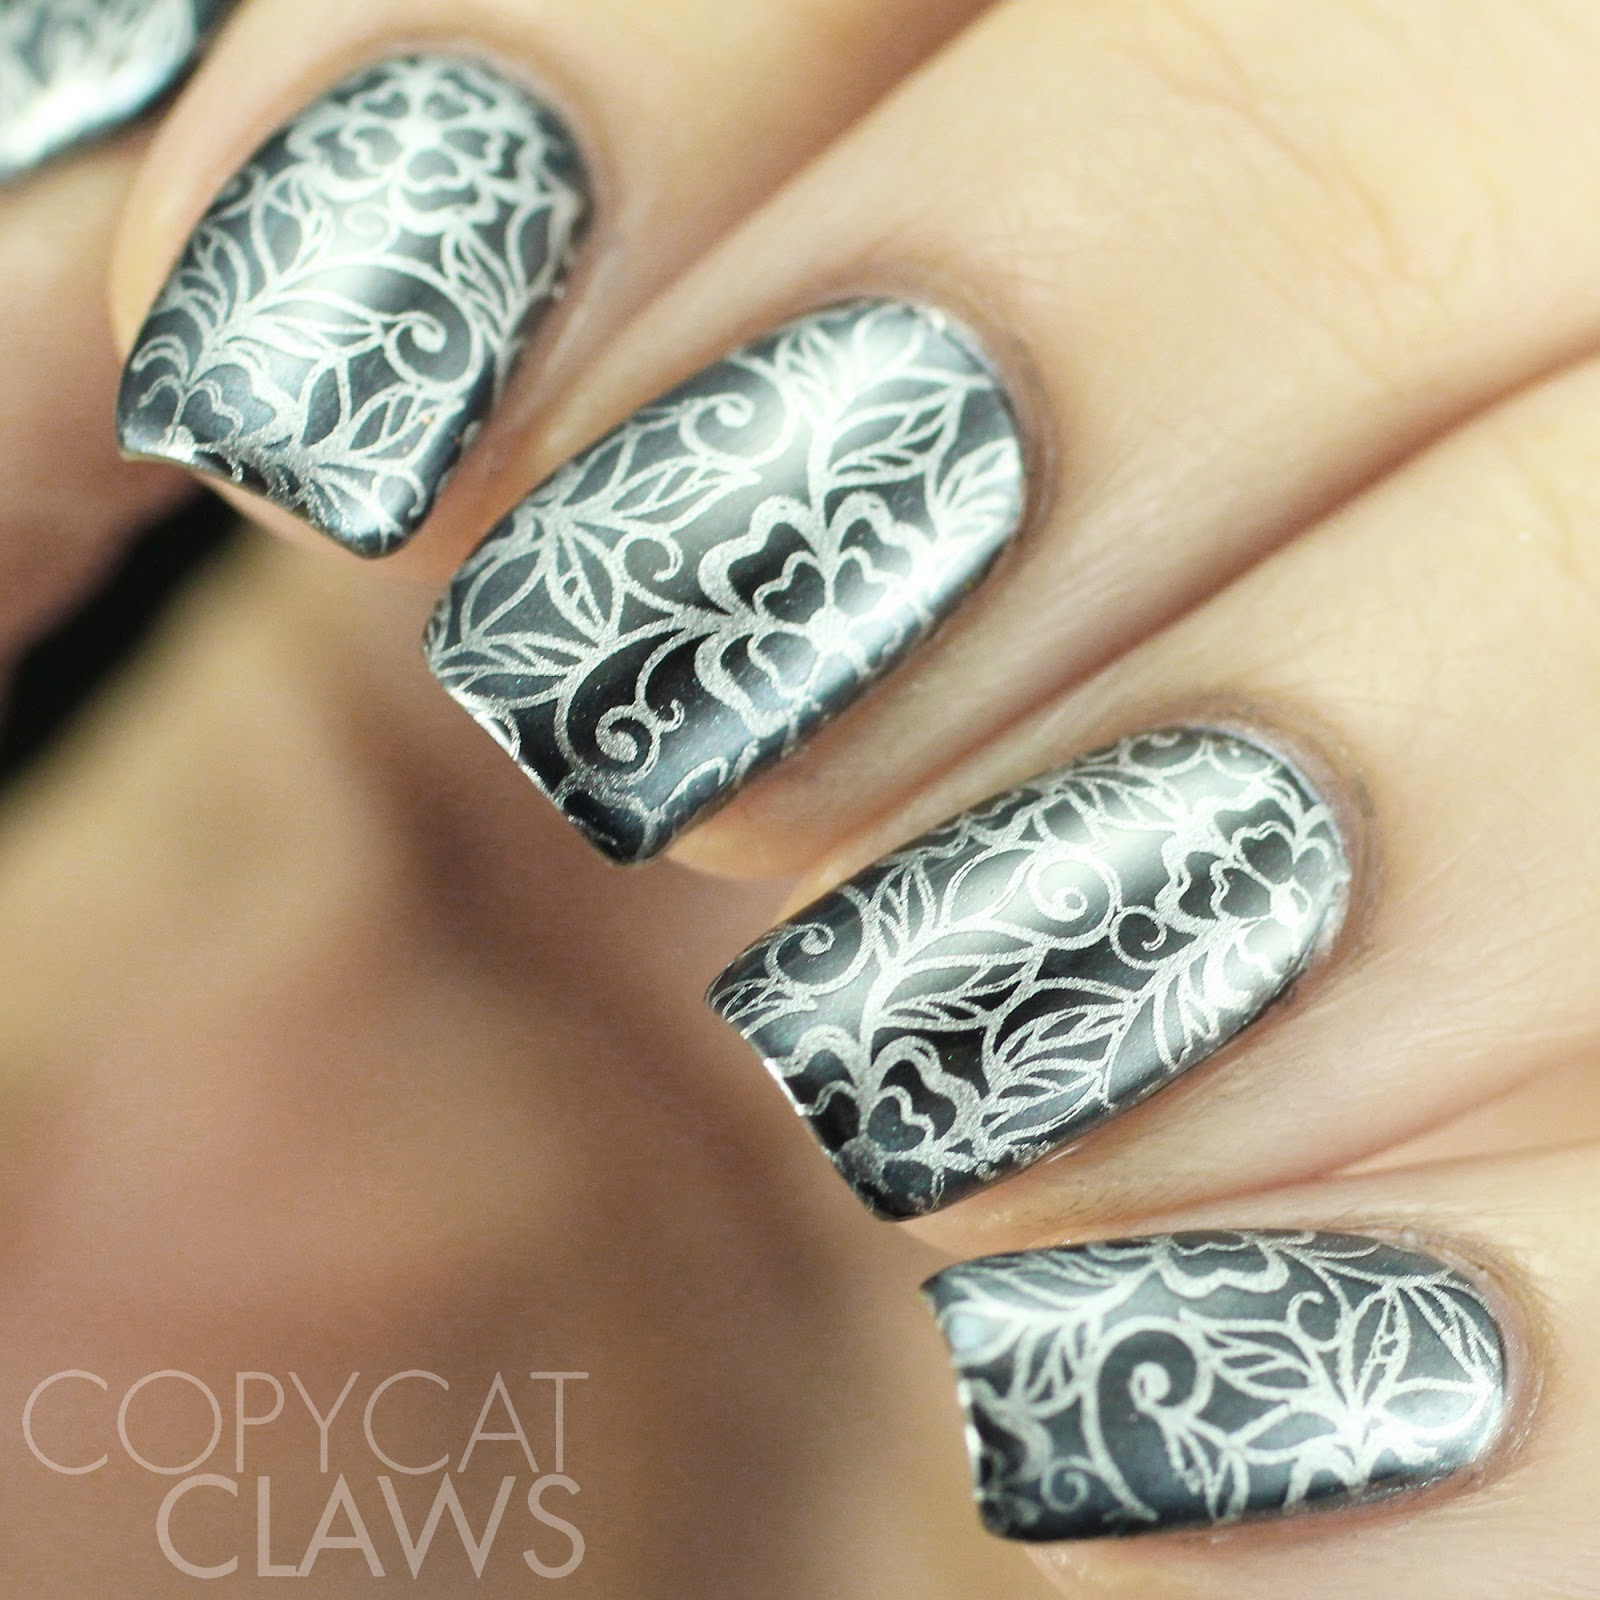 Copycat Claws: Beauty Bigbang Nail Product Review